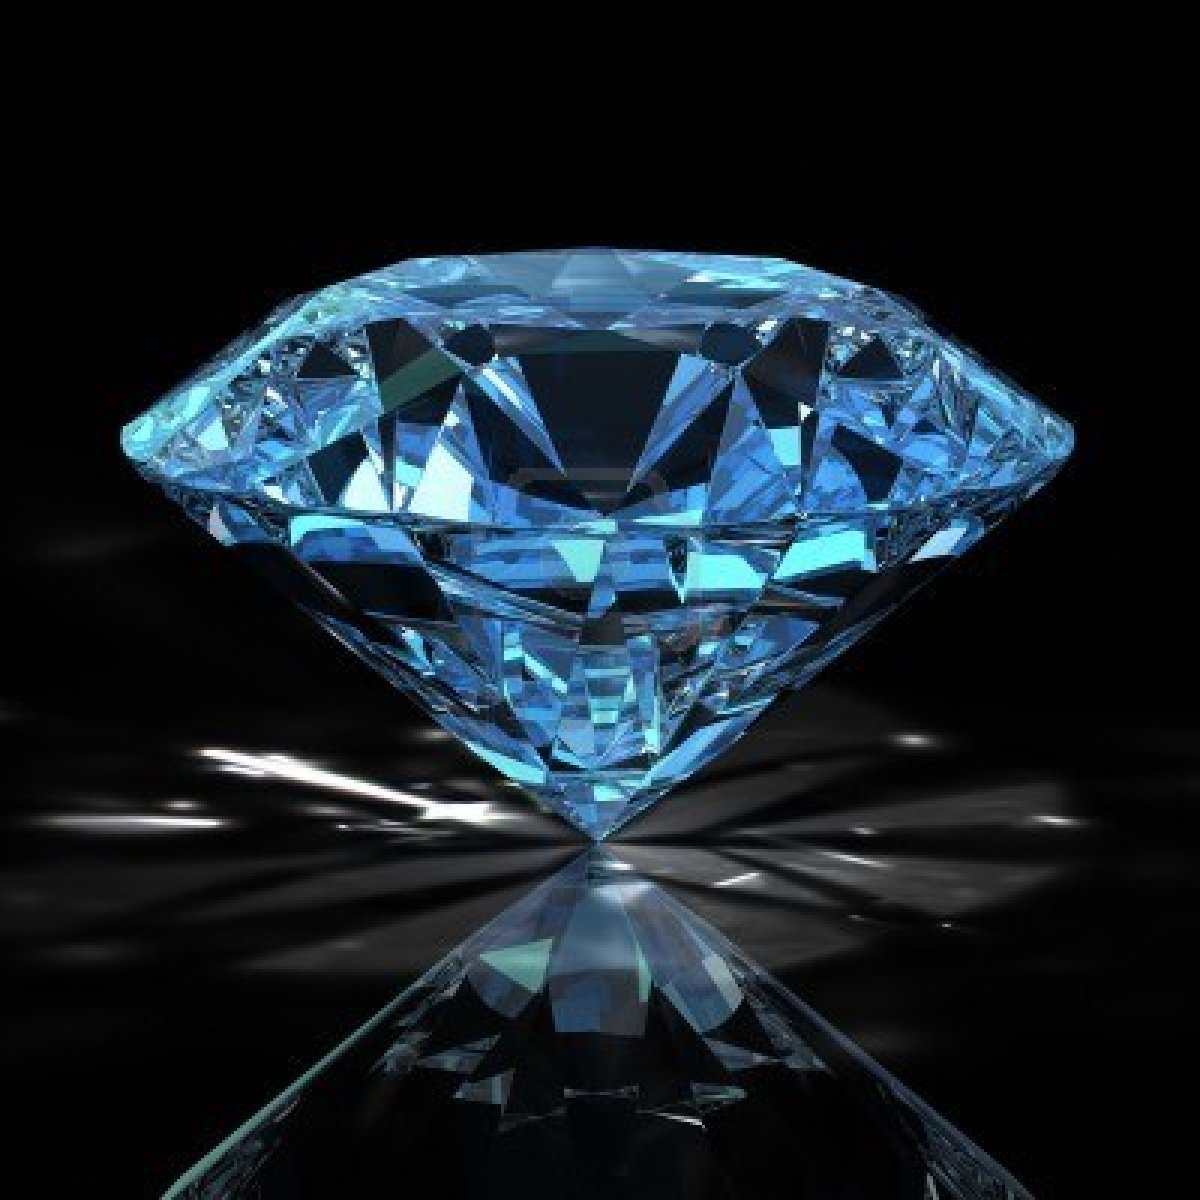 Rihanna Diamond 2013 V Remix By Alex Castillo 1200x1200